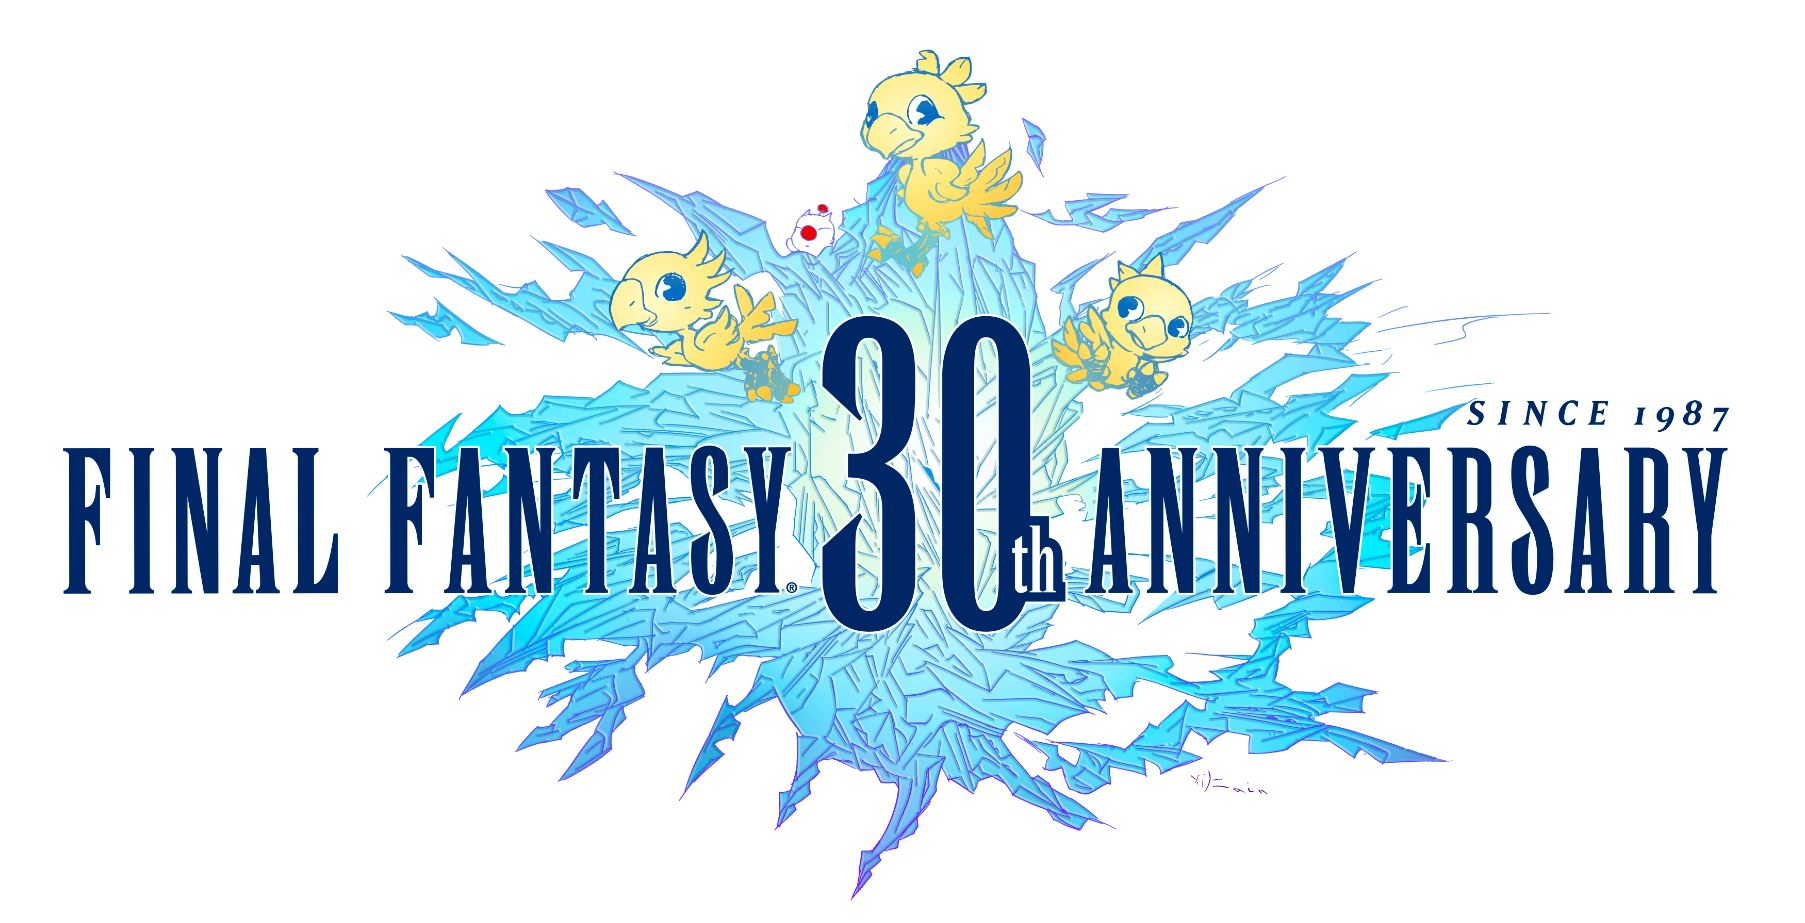 Square Enix Kicks Off Final Fantasy's 30th Anniversary